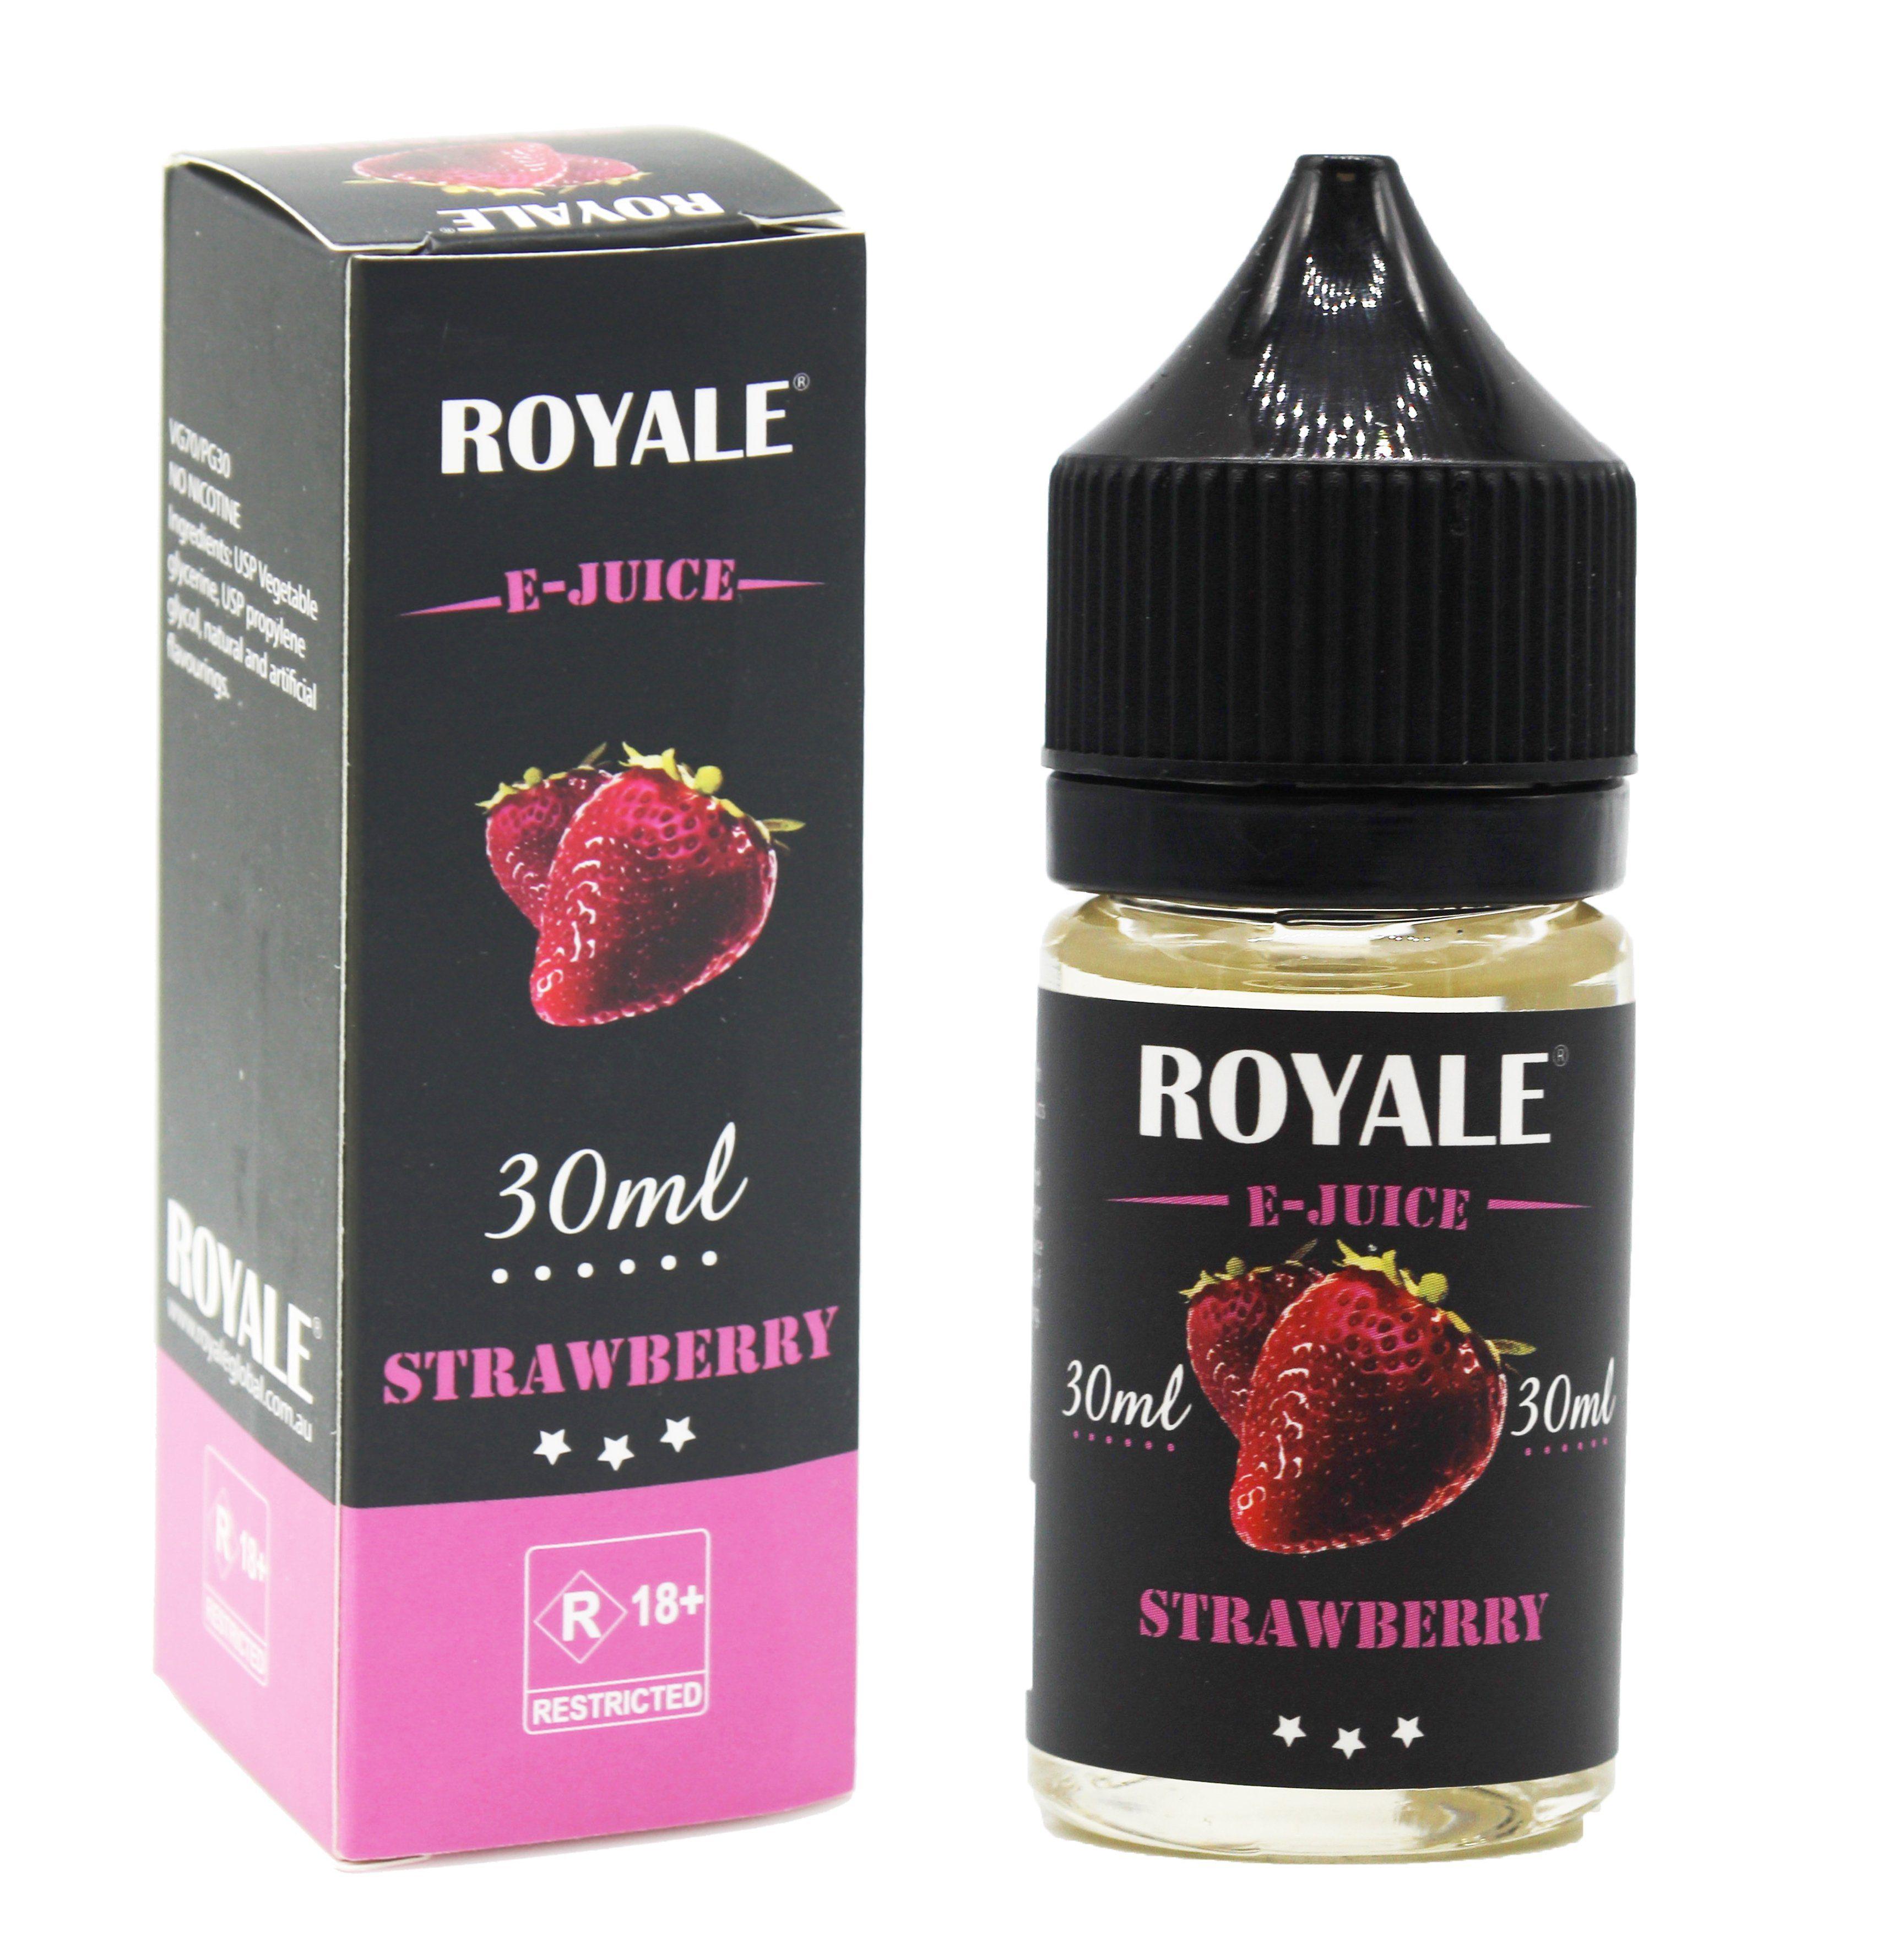 Royale E-juice- Strawberry